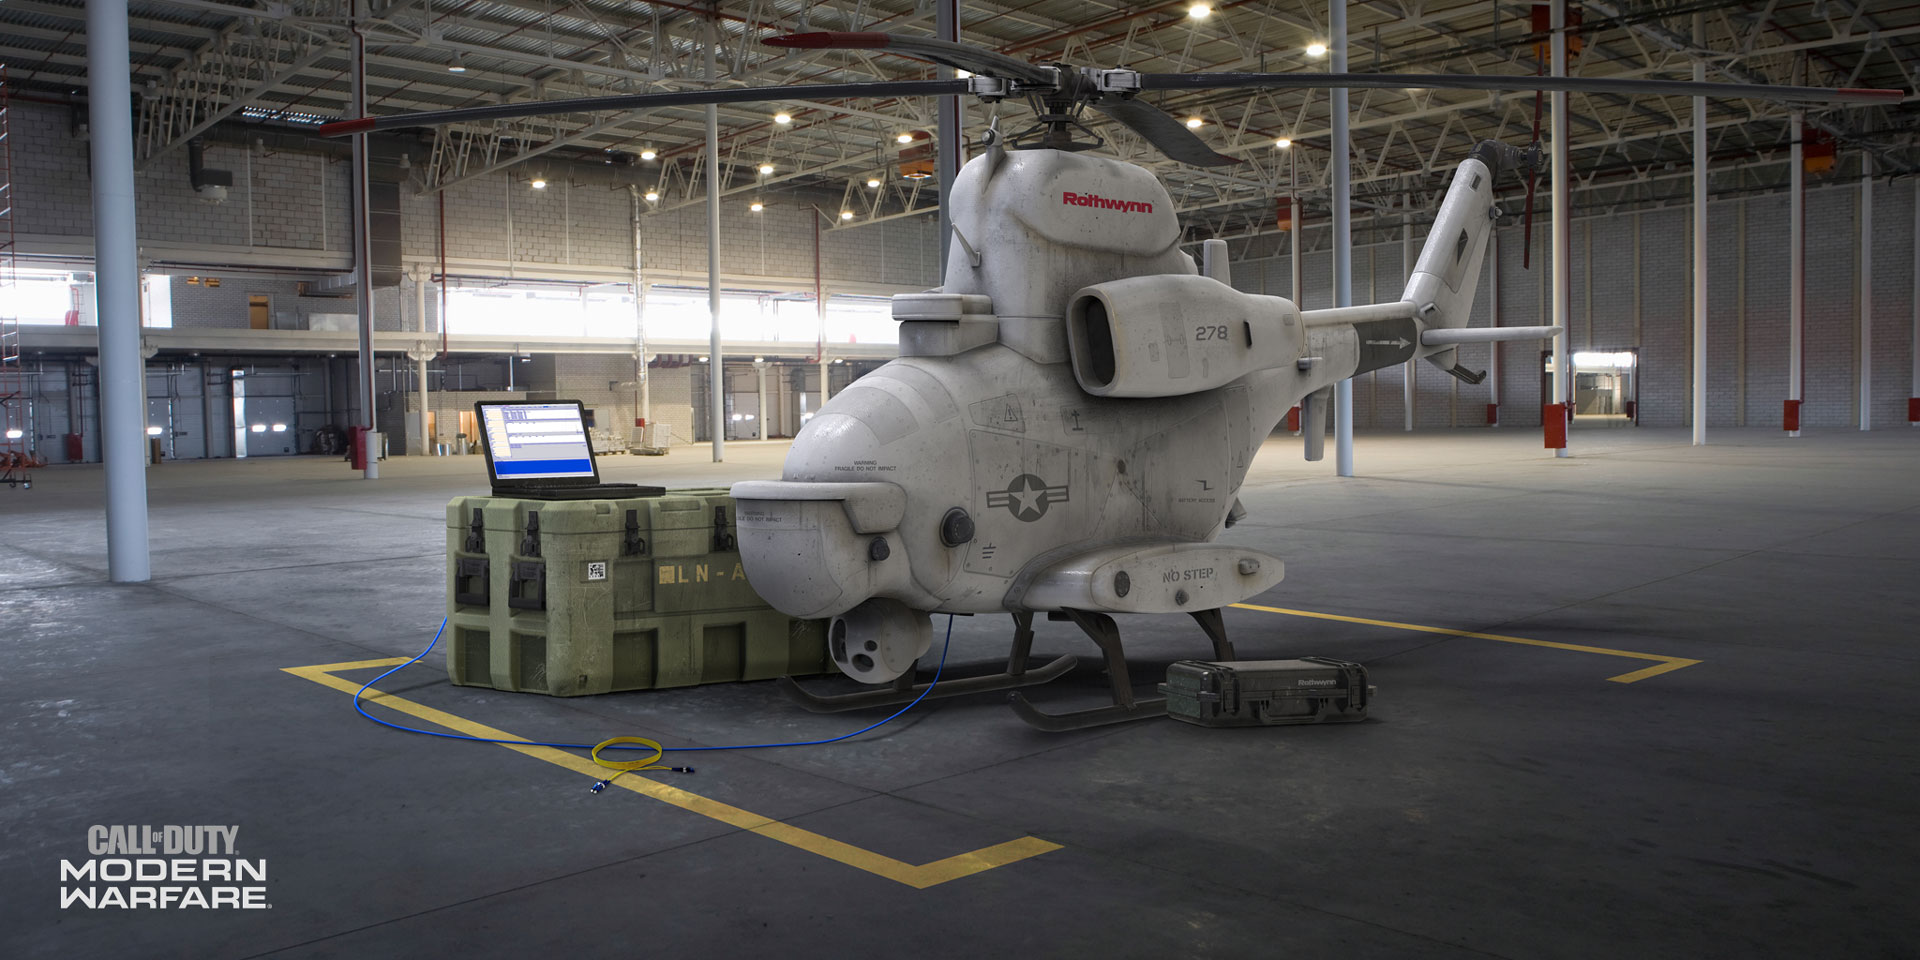 A Personal Radar killstreak from Modern Warfare.